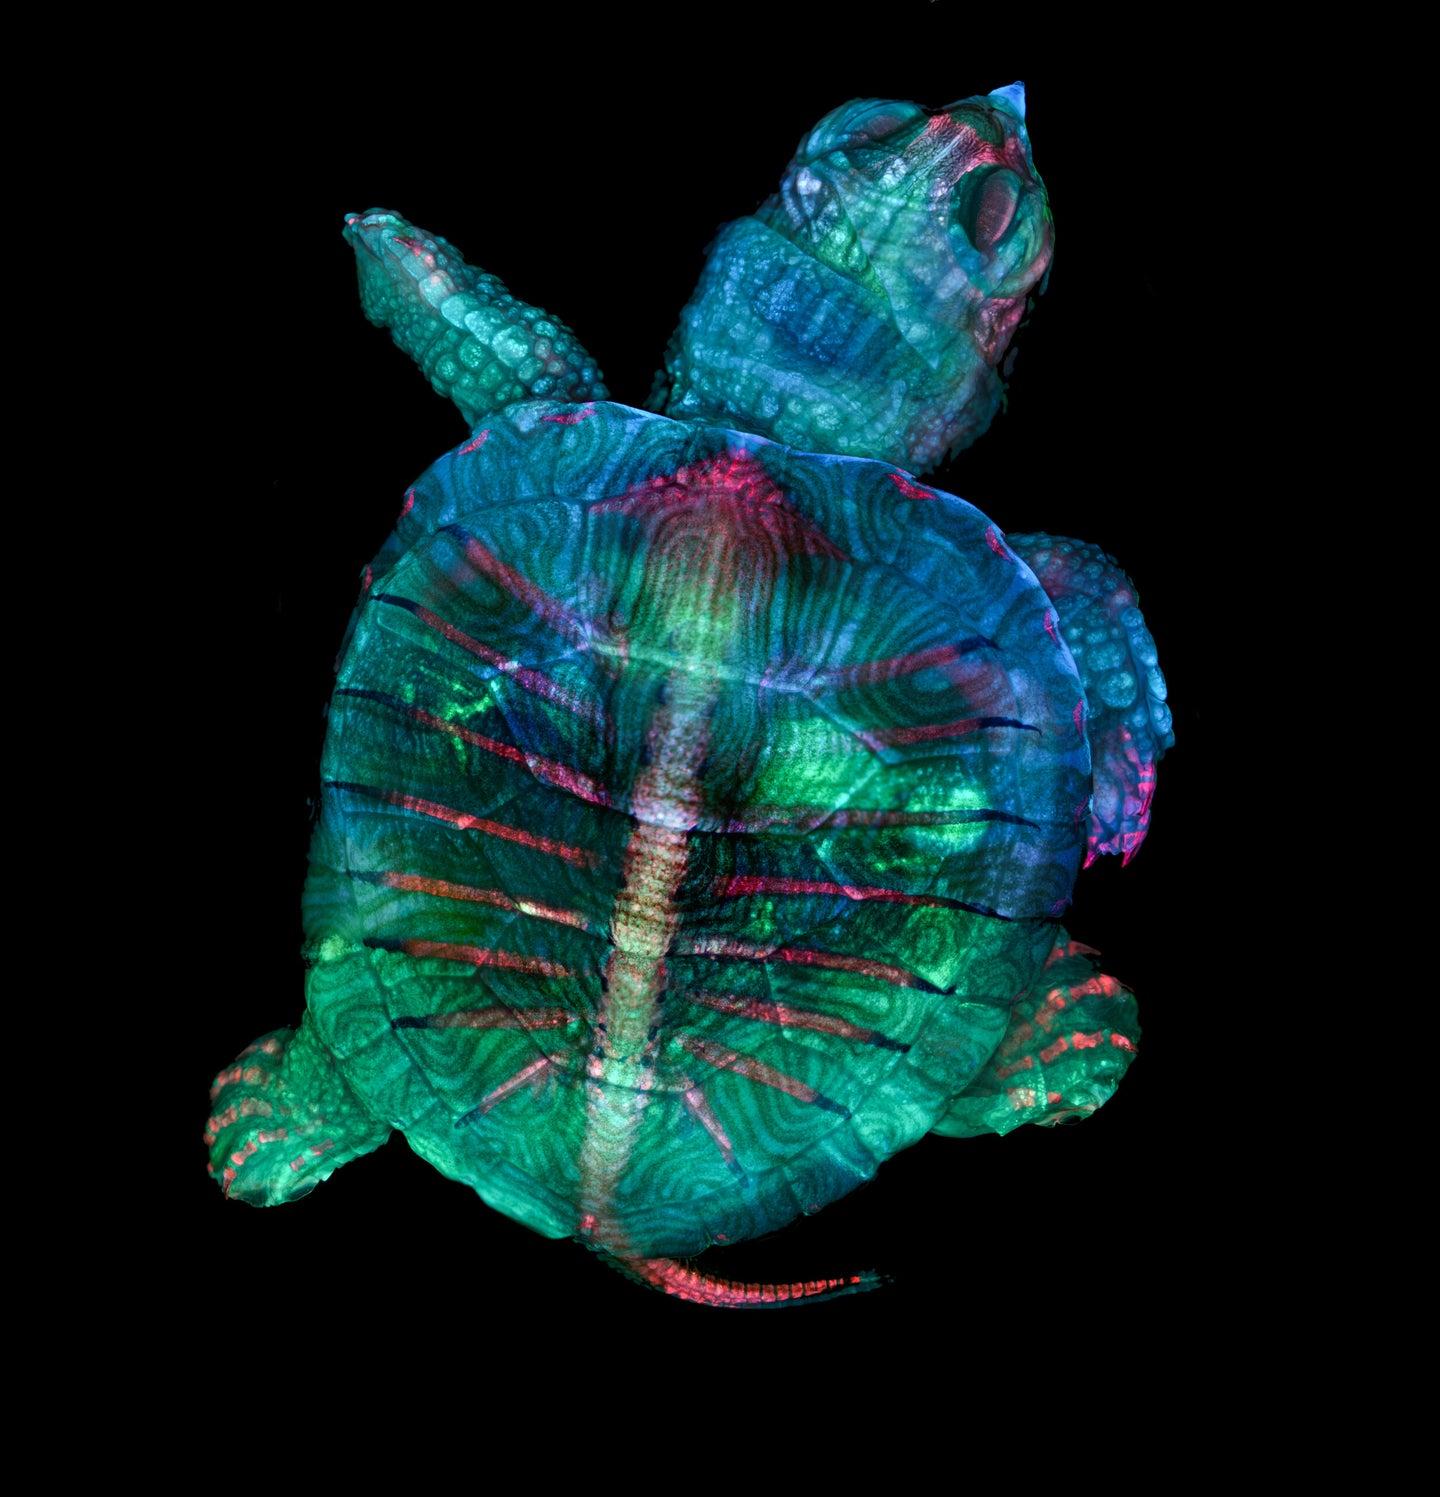 A fluorescent turtle embryo